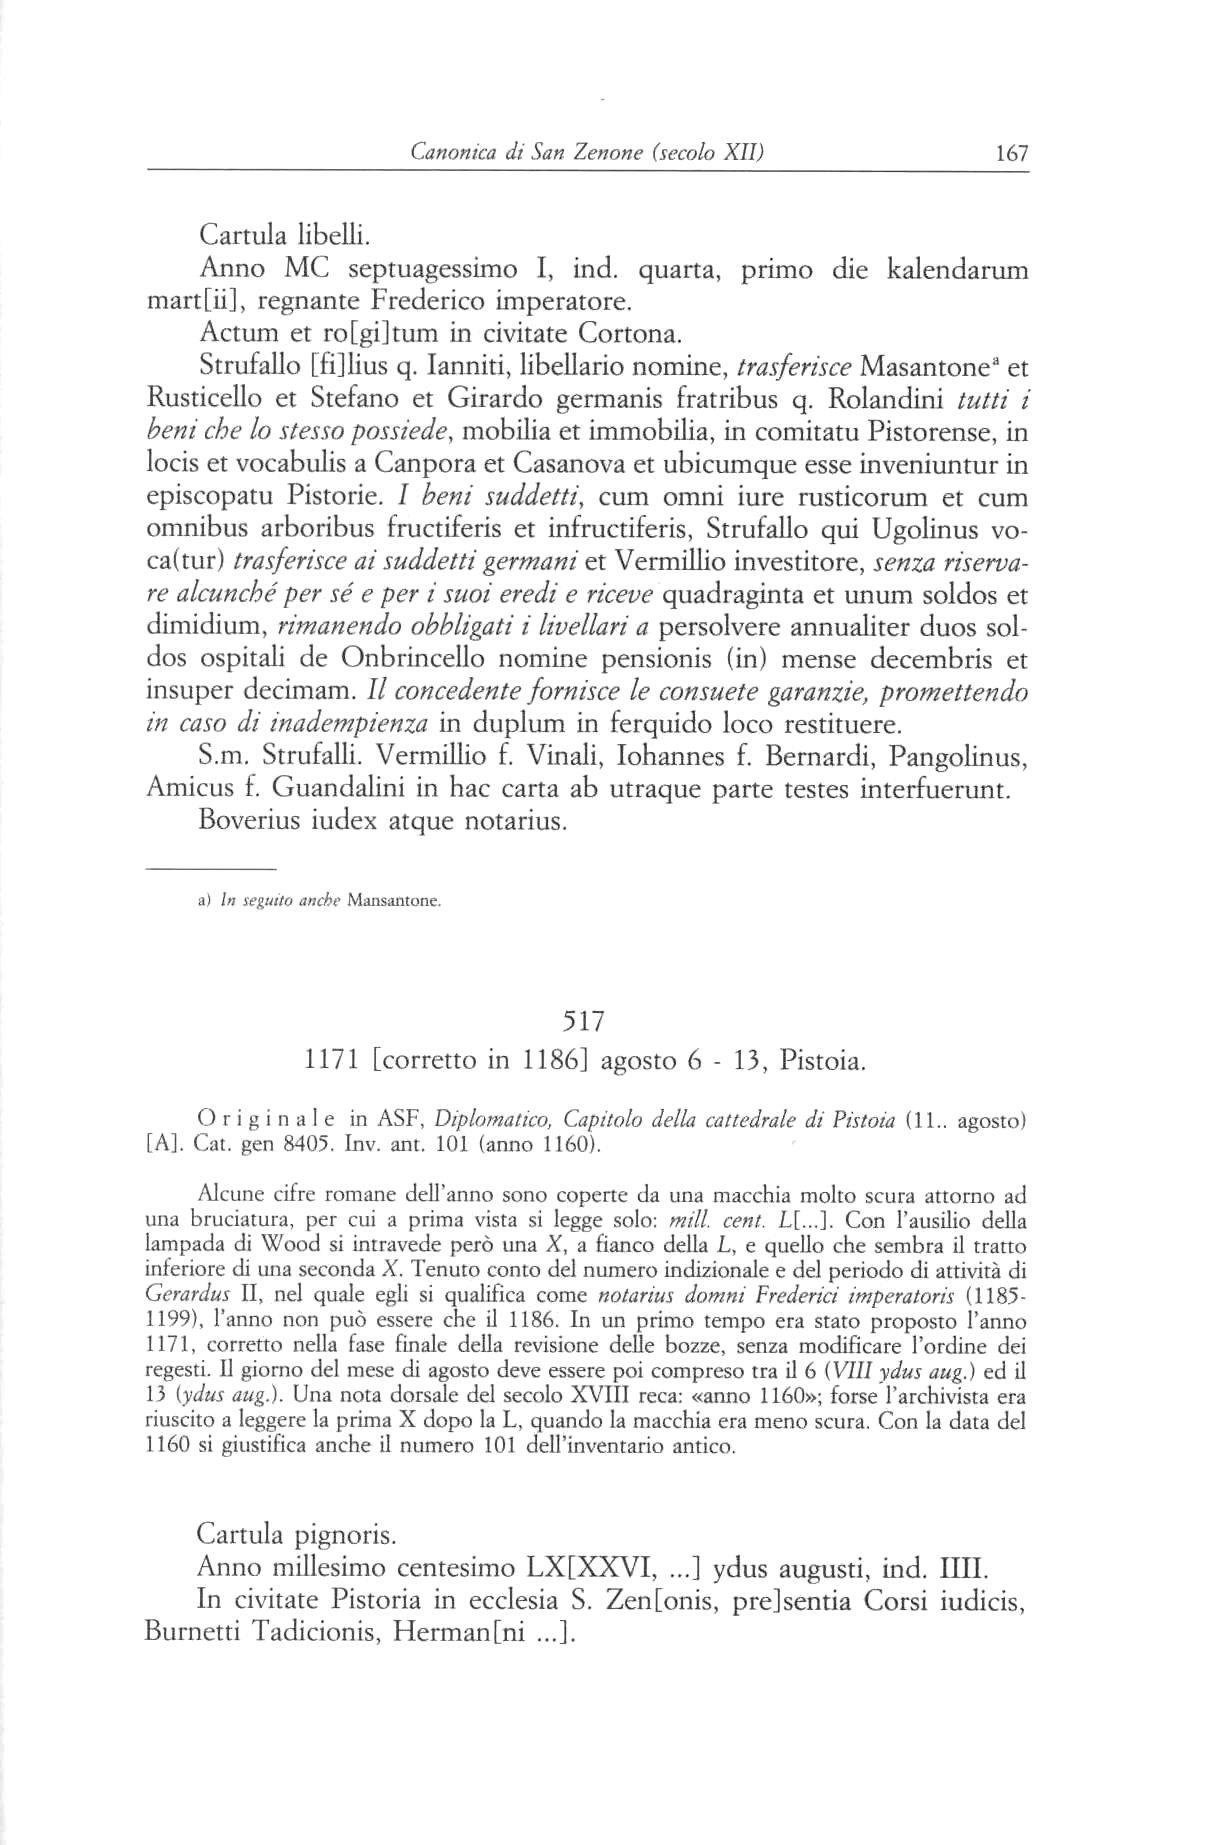 Canonica S. Zenone XII 0167.jpg